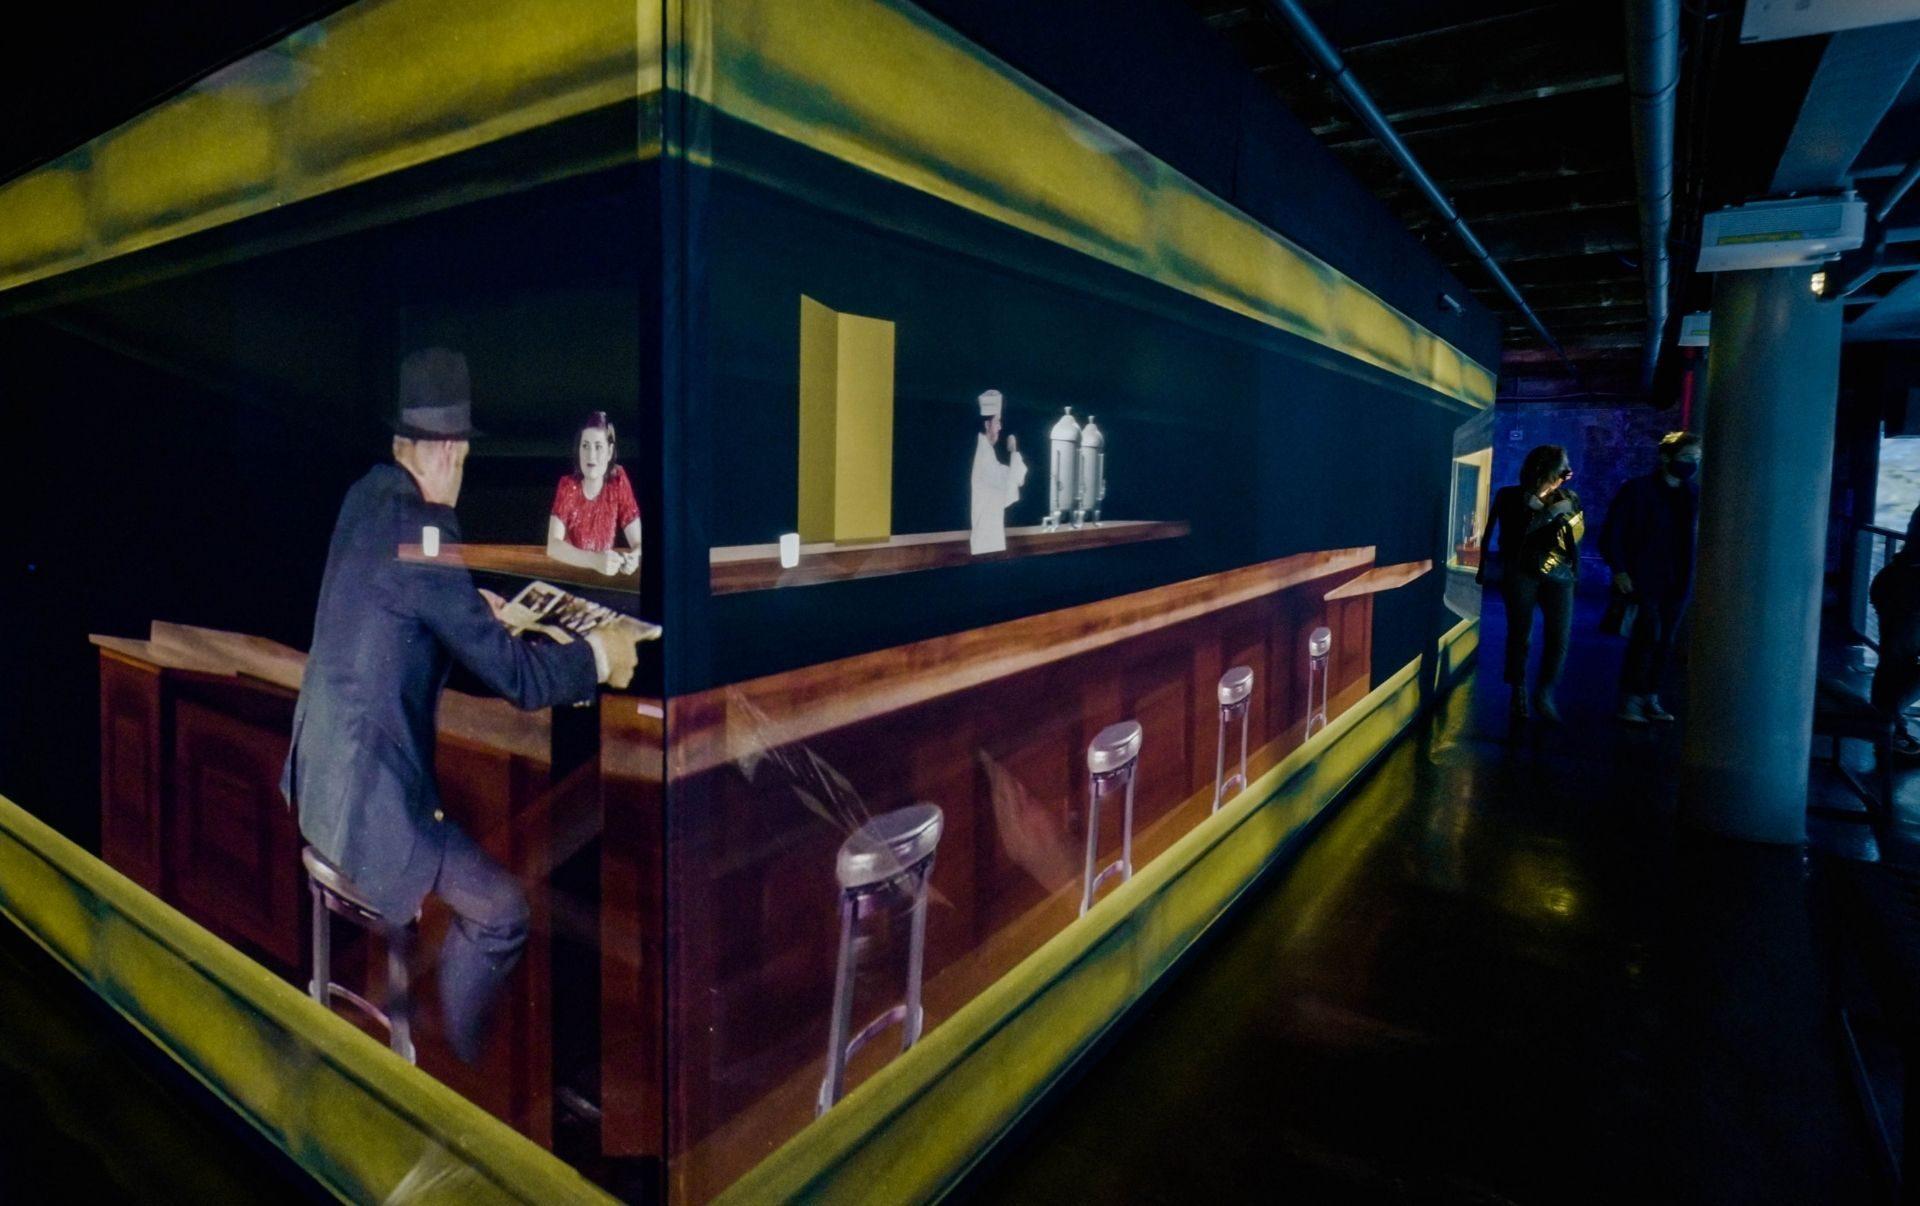 artechouse bar illusion immersive art new york city